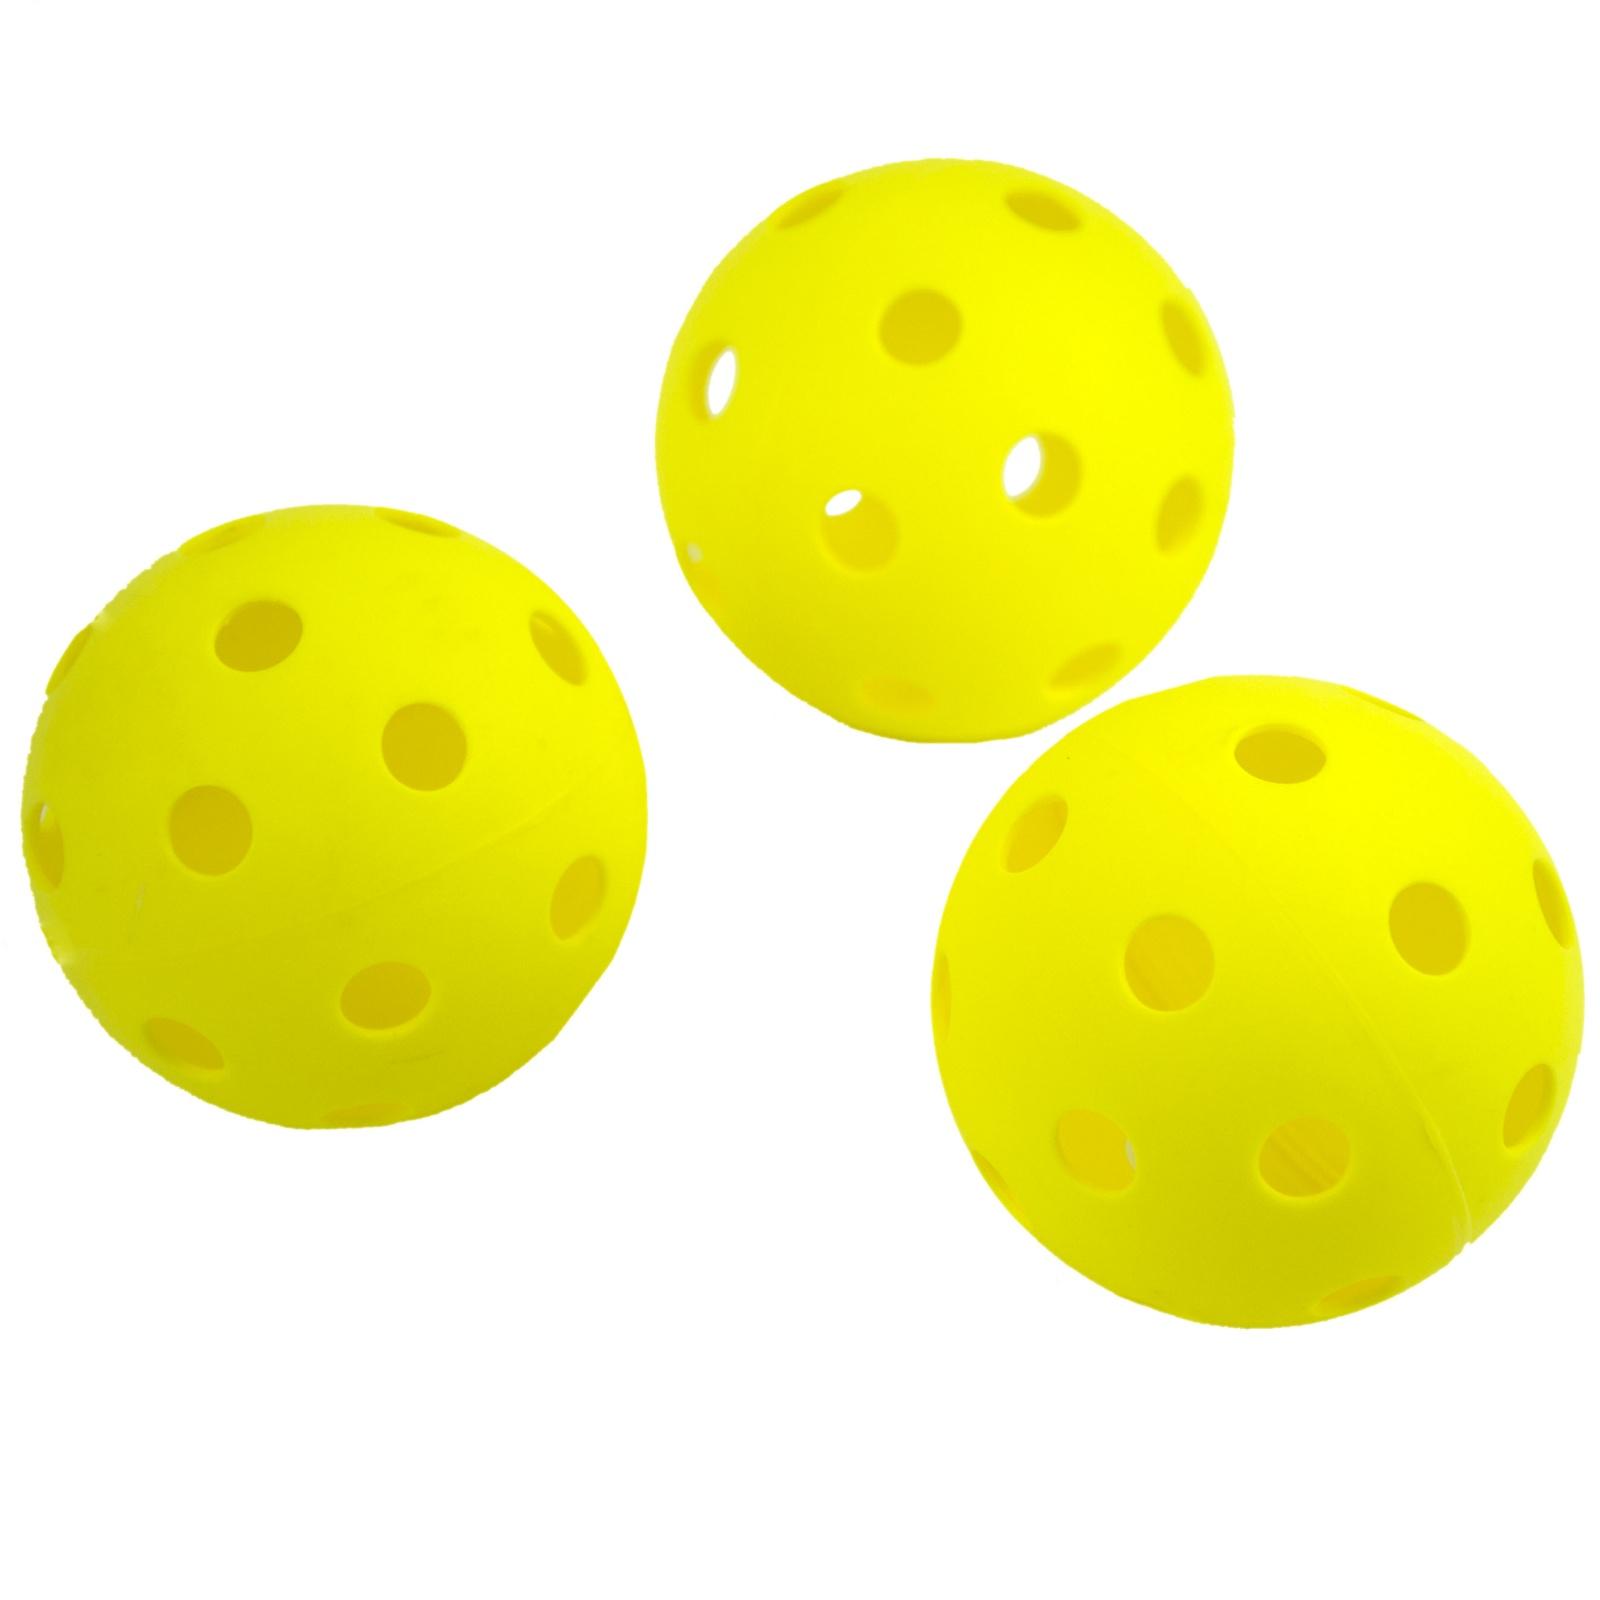 Florbalové míčky SPOKEY Turn - 3ks, žluté